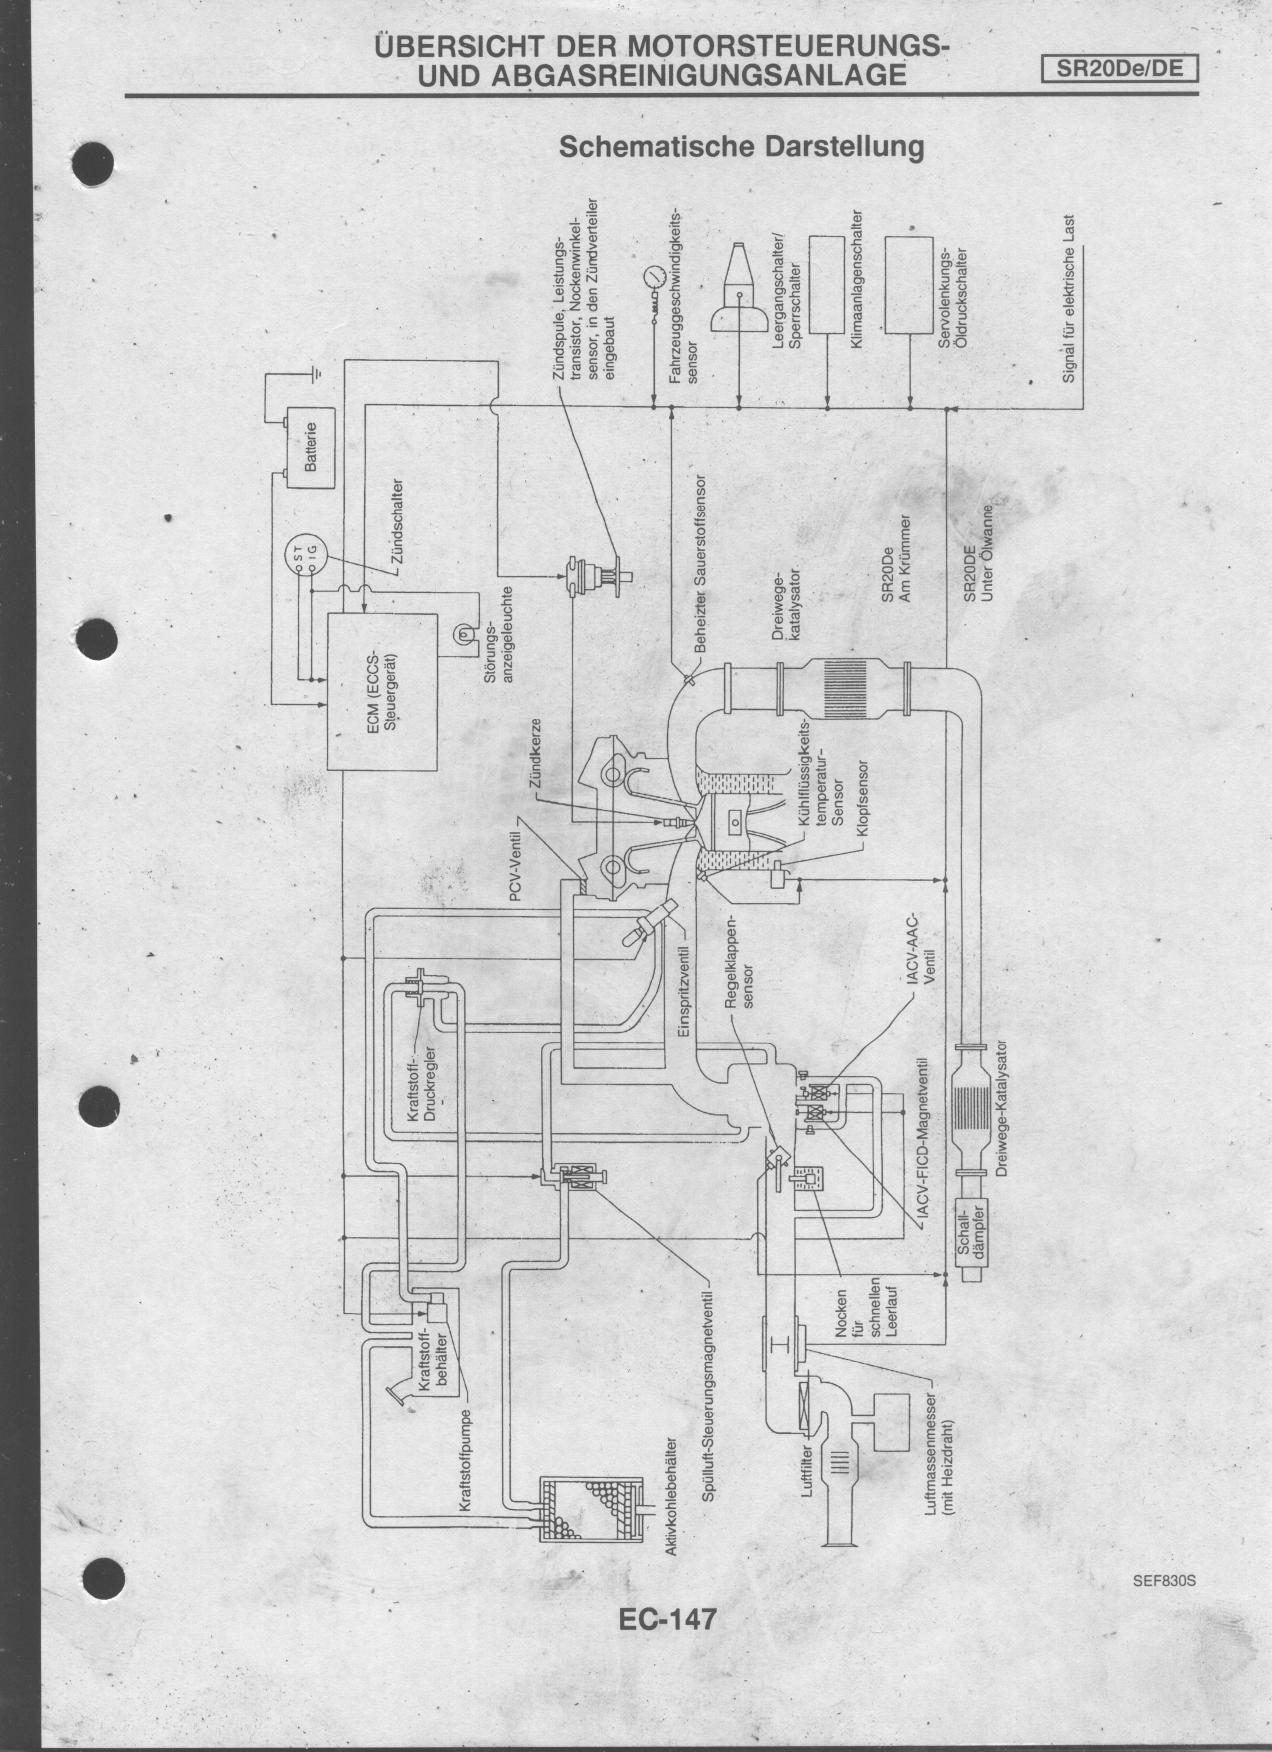 Berühmt Ford Zündspule Schaltplan Ideen - Der Schaltplan - triangre.info